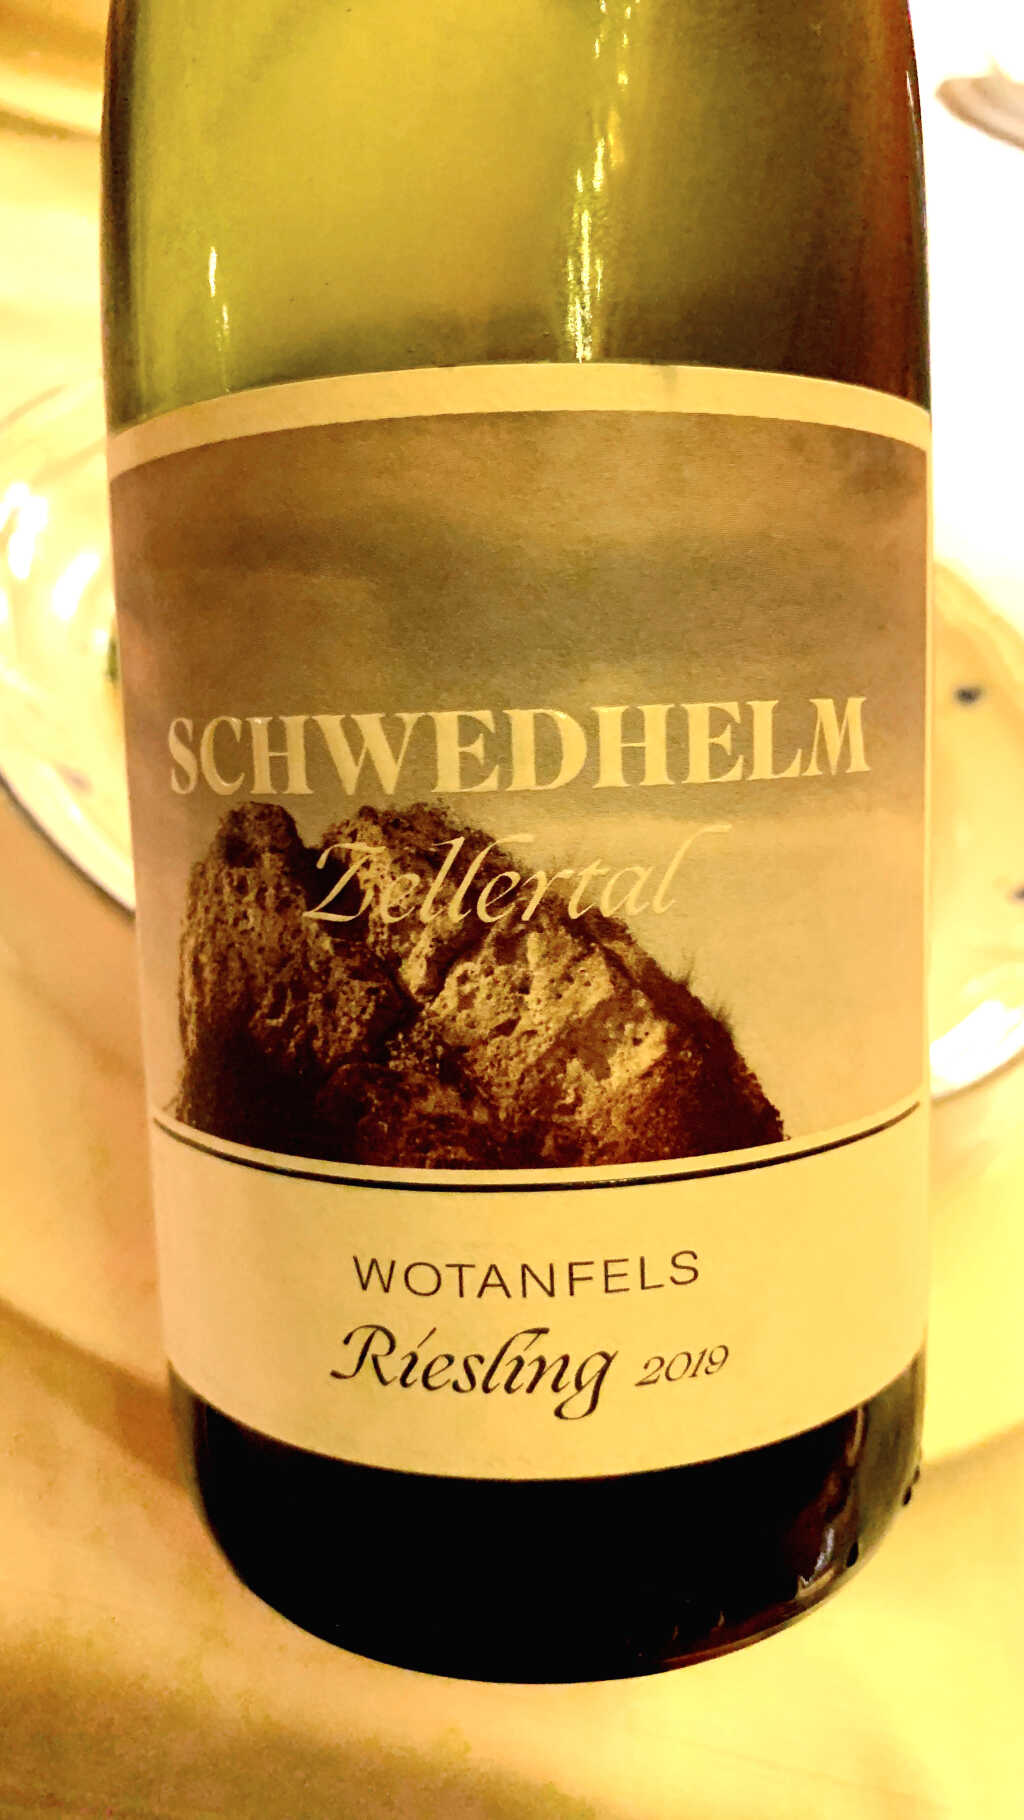 2019 Schwedhelm Wotanfels Riesling